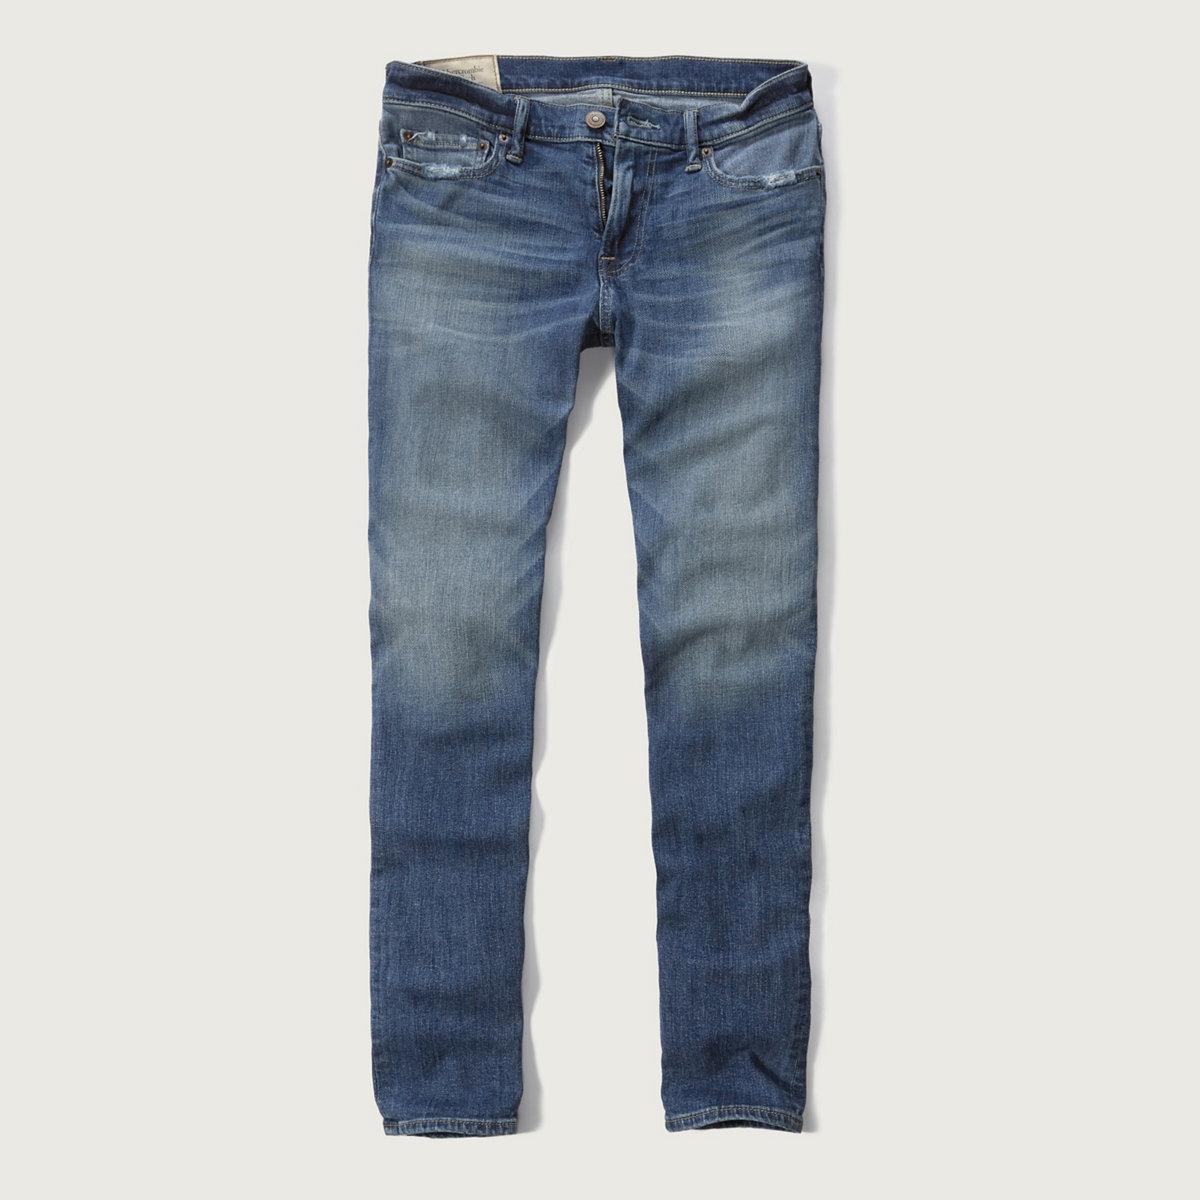 Super Skinny Everyday Stretch Jeans